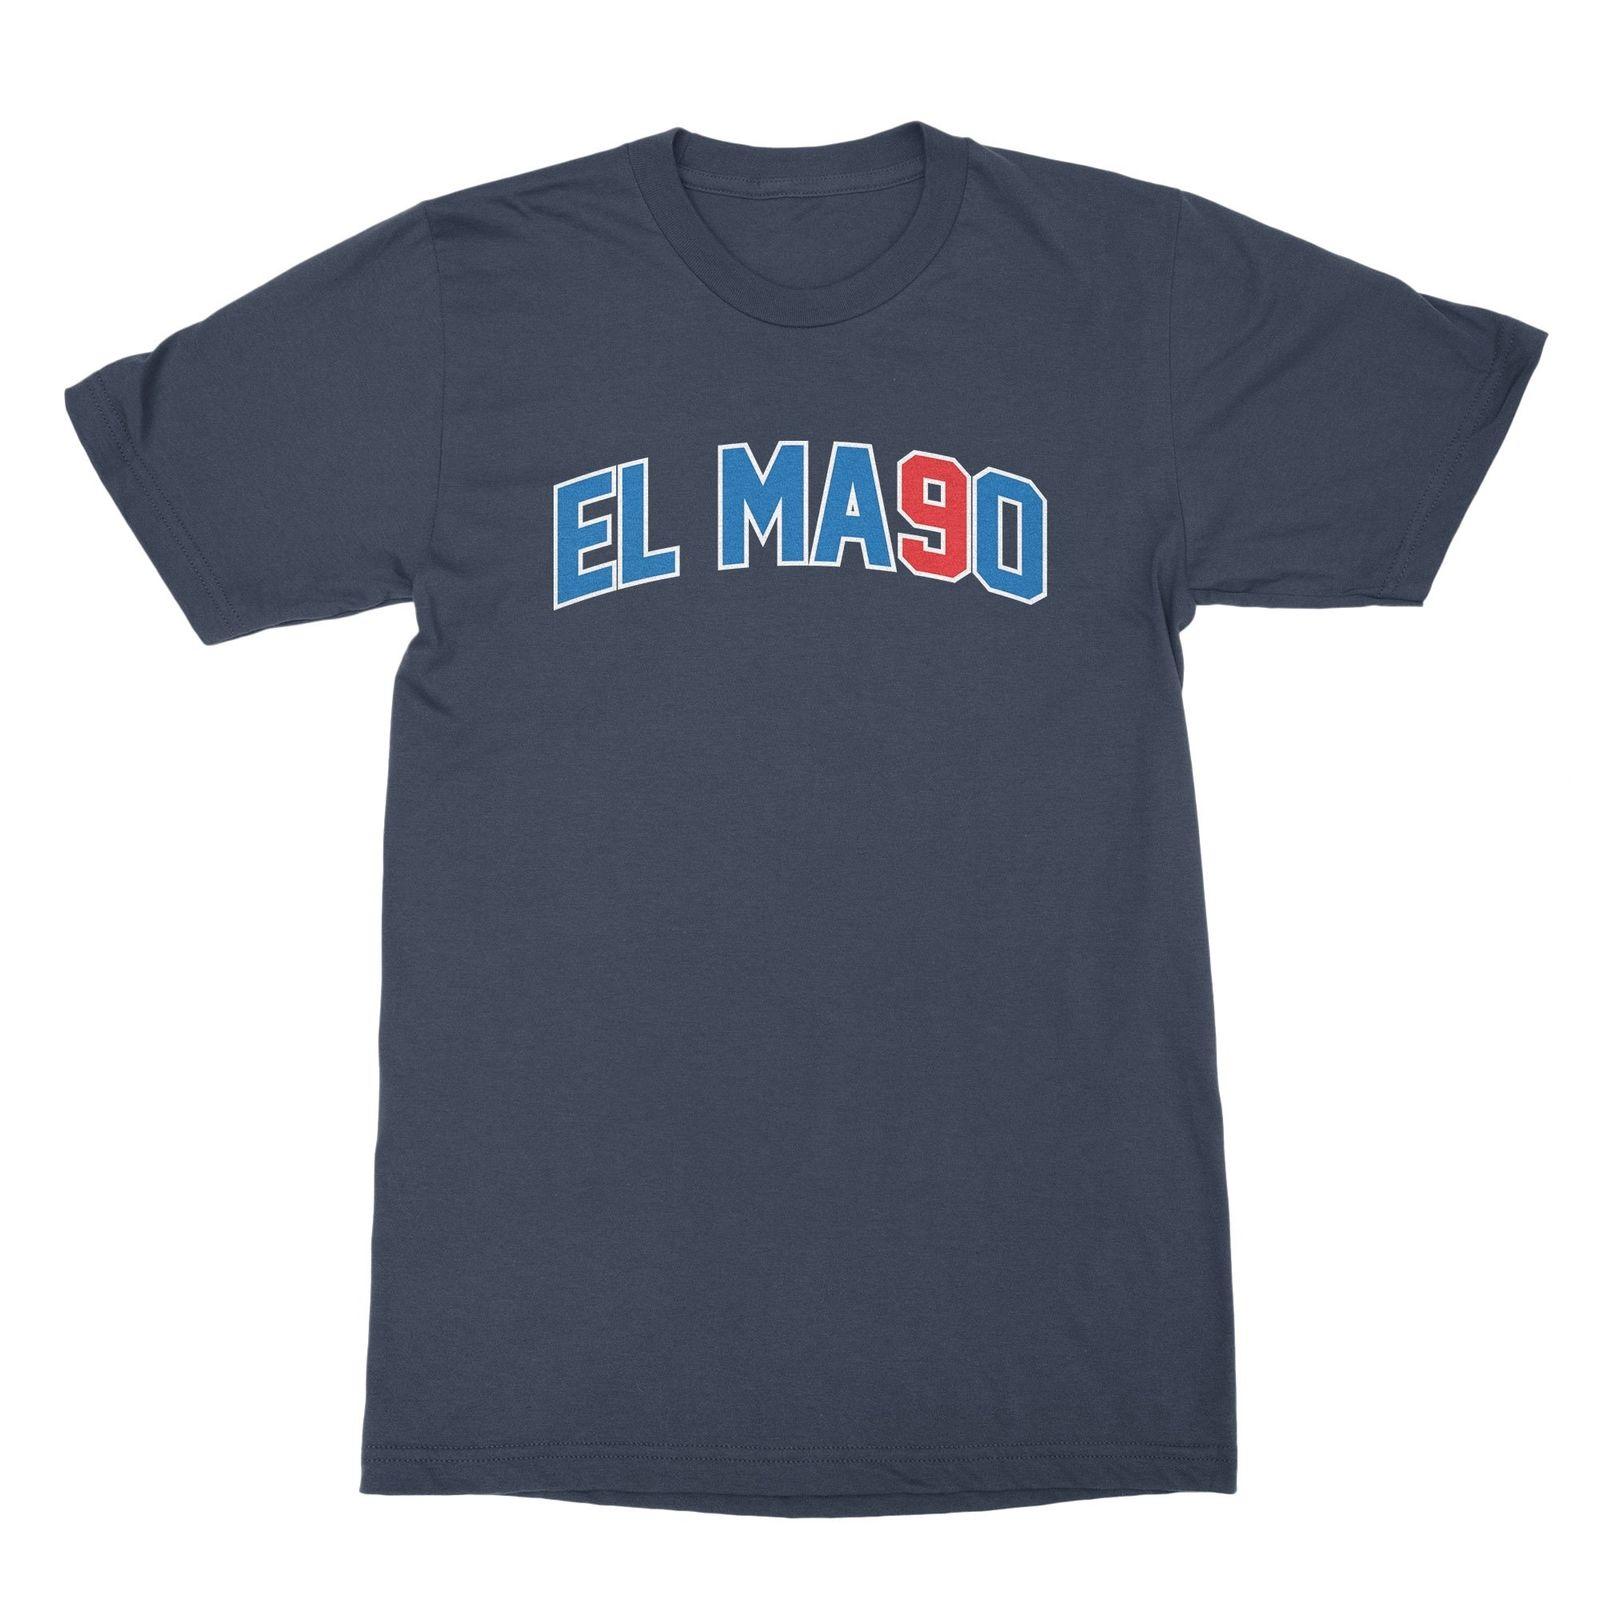 Expressive El Mago Shirt Cubs Javier Javy Baez El Mago T Shirt Free Shipping Tops T Shirt Fashion Classic Unique Gift T-shirts